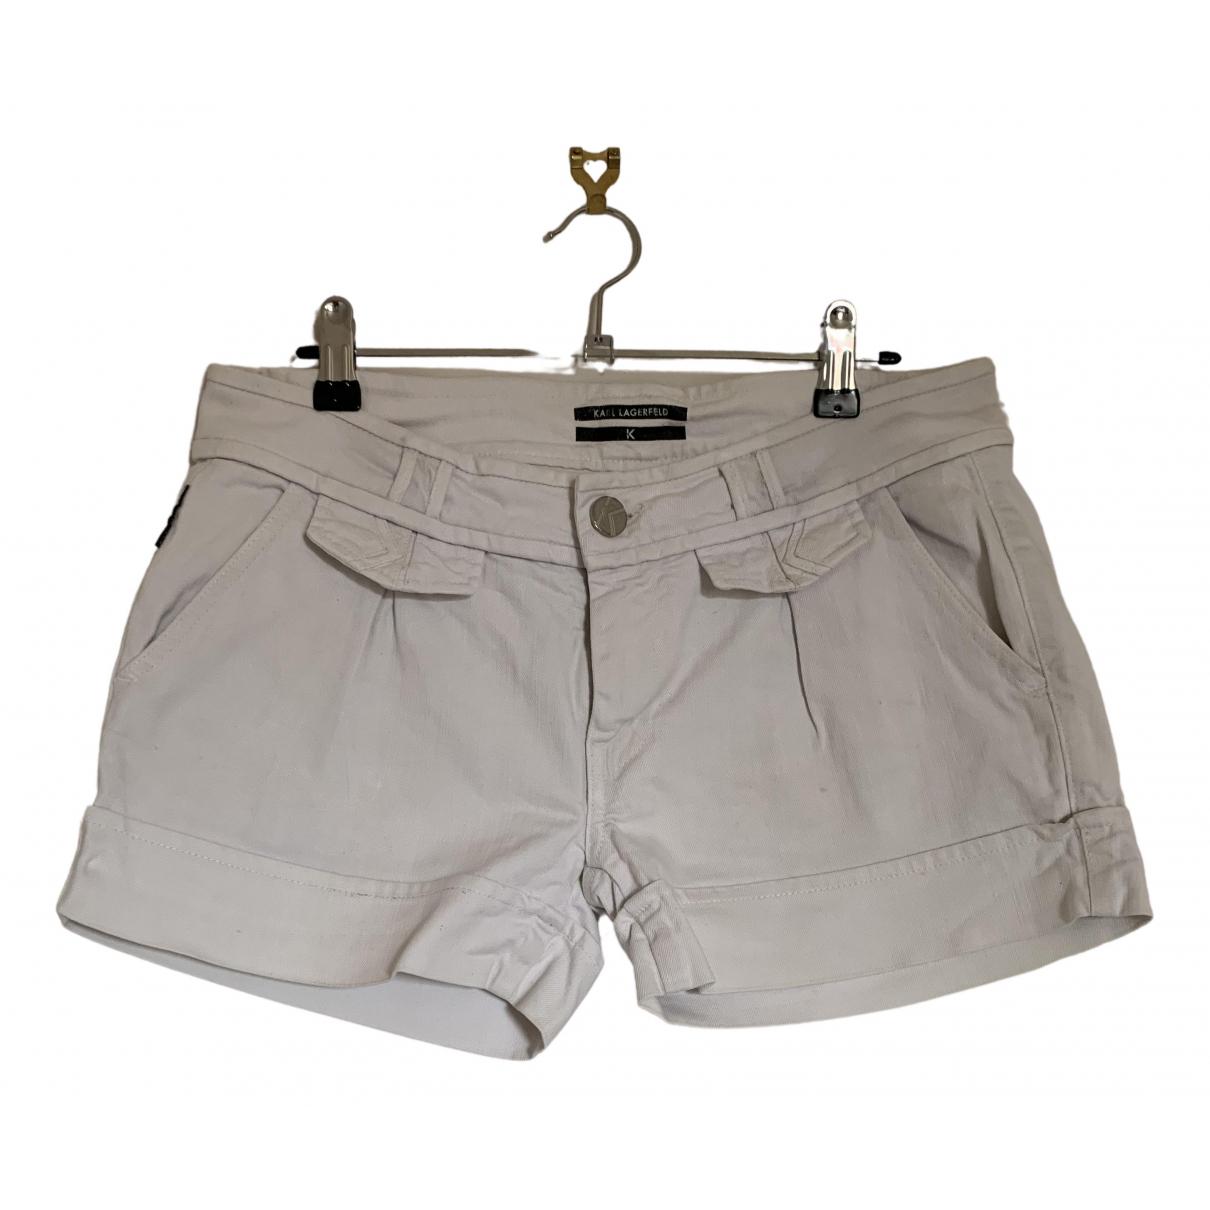 Karl Lagerfeld \N Shorts in  Weiss Baumwolle